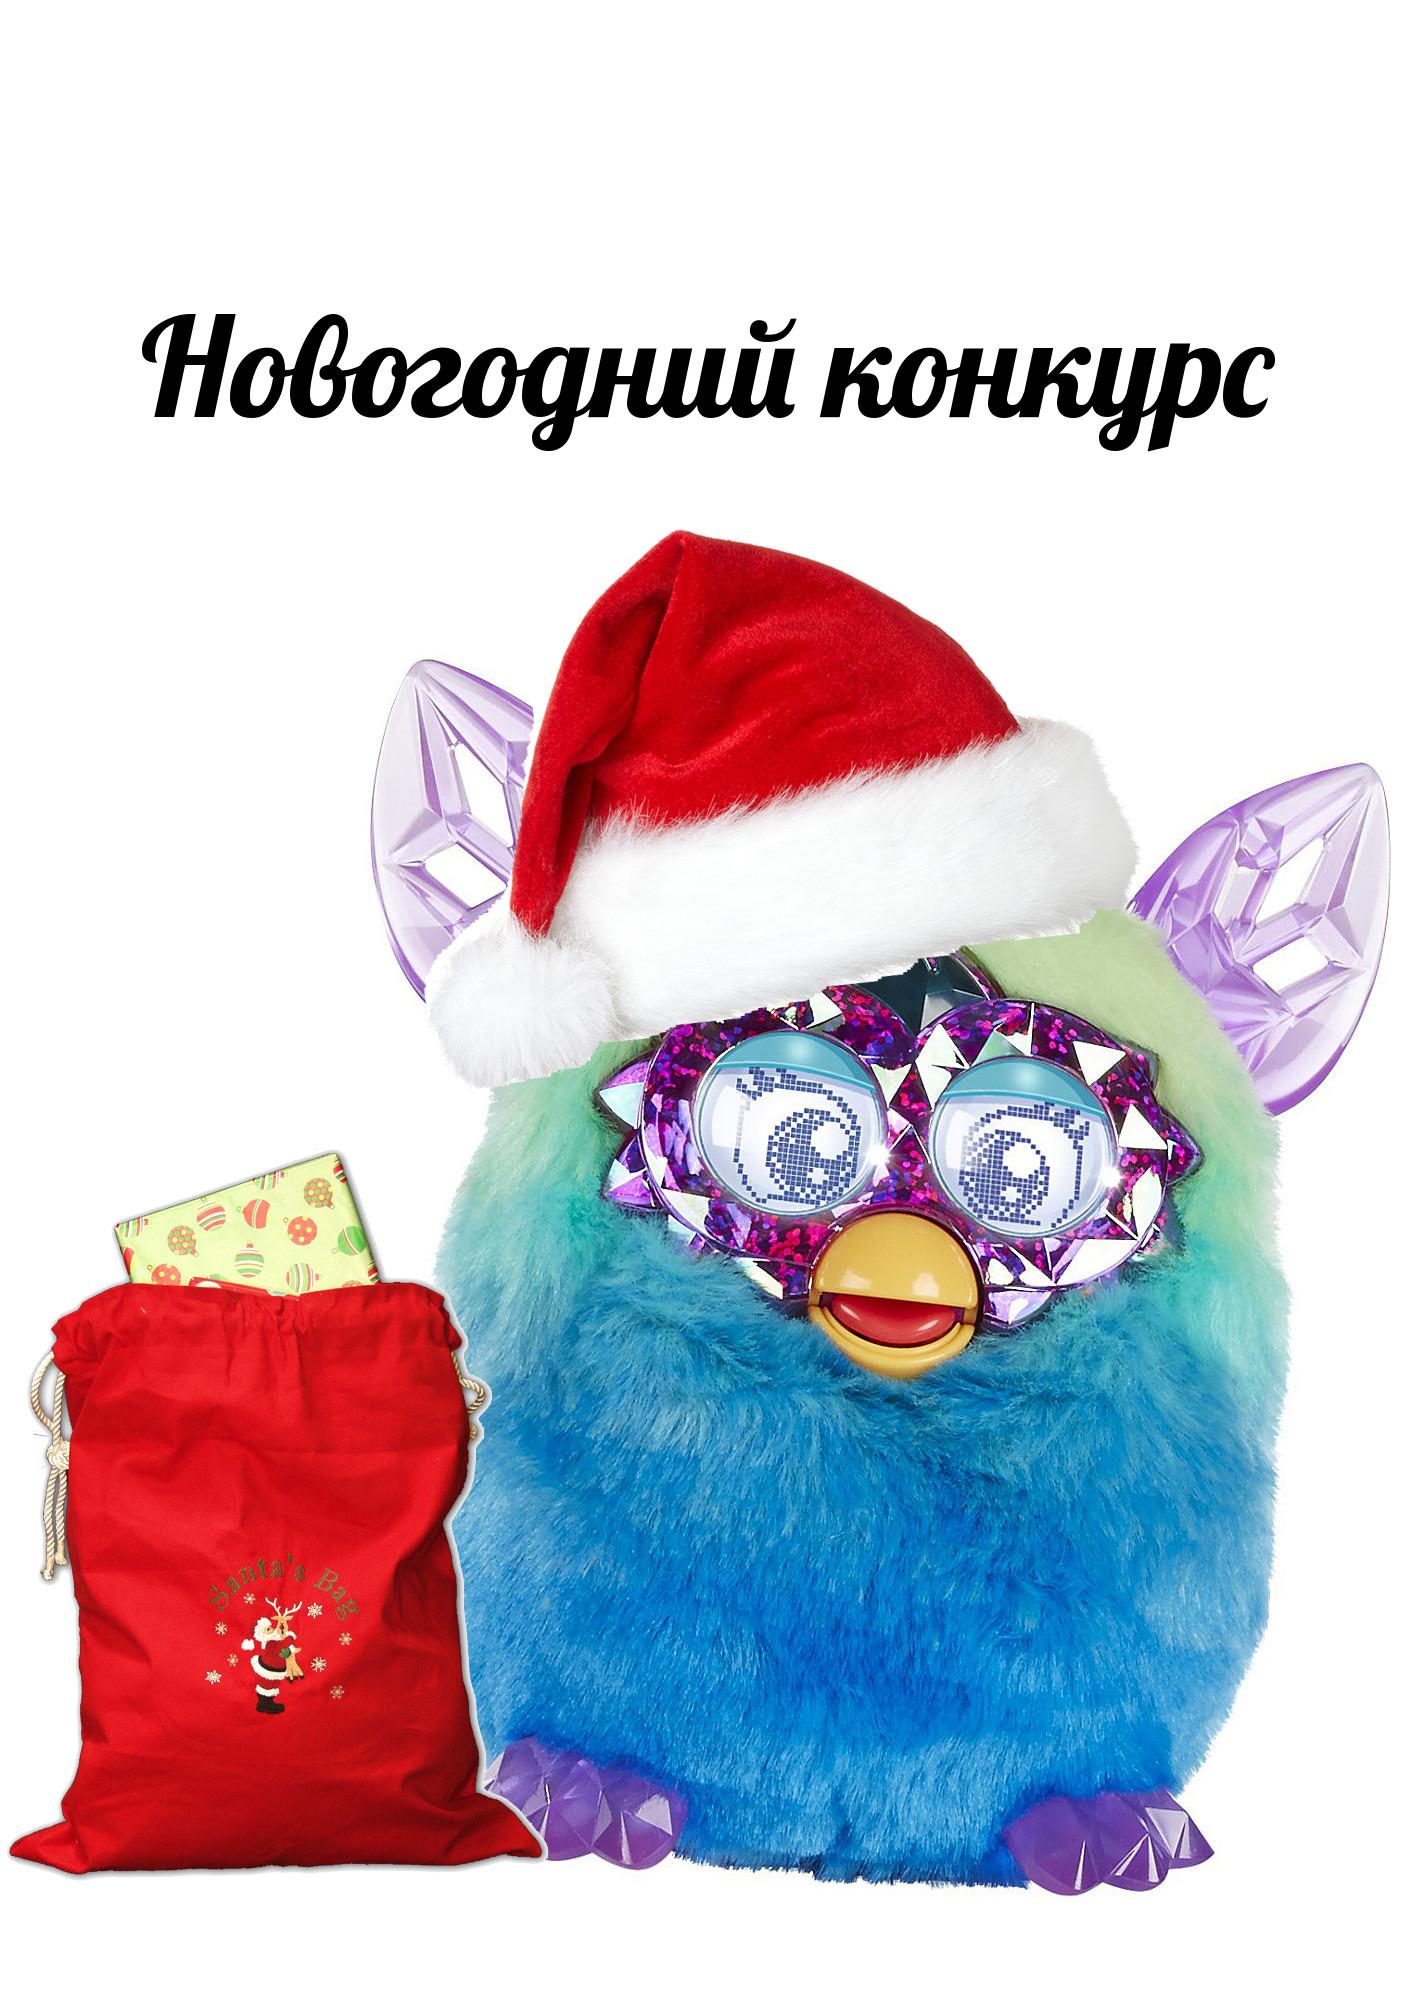 на русском об: